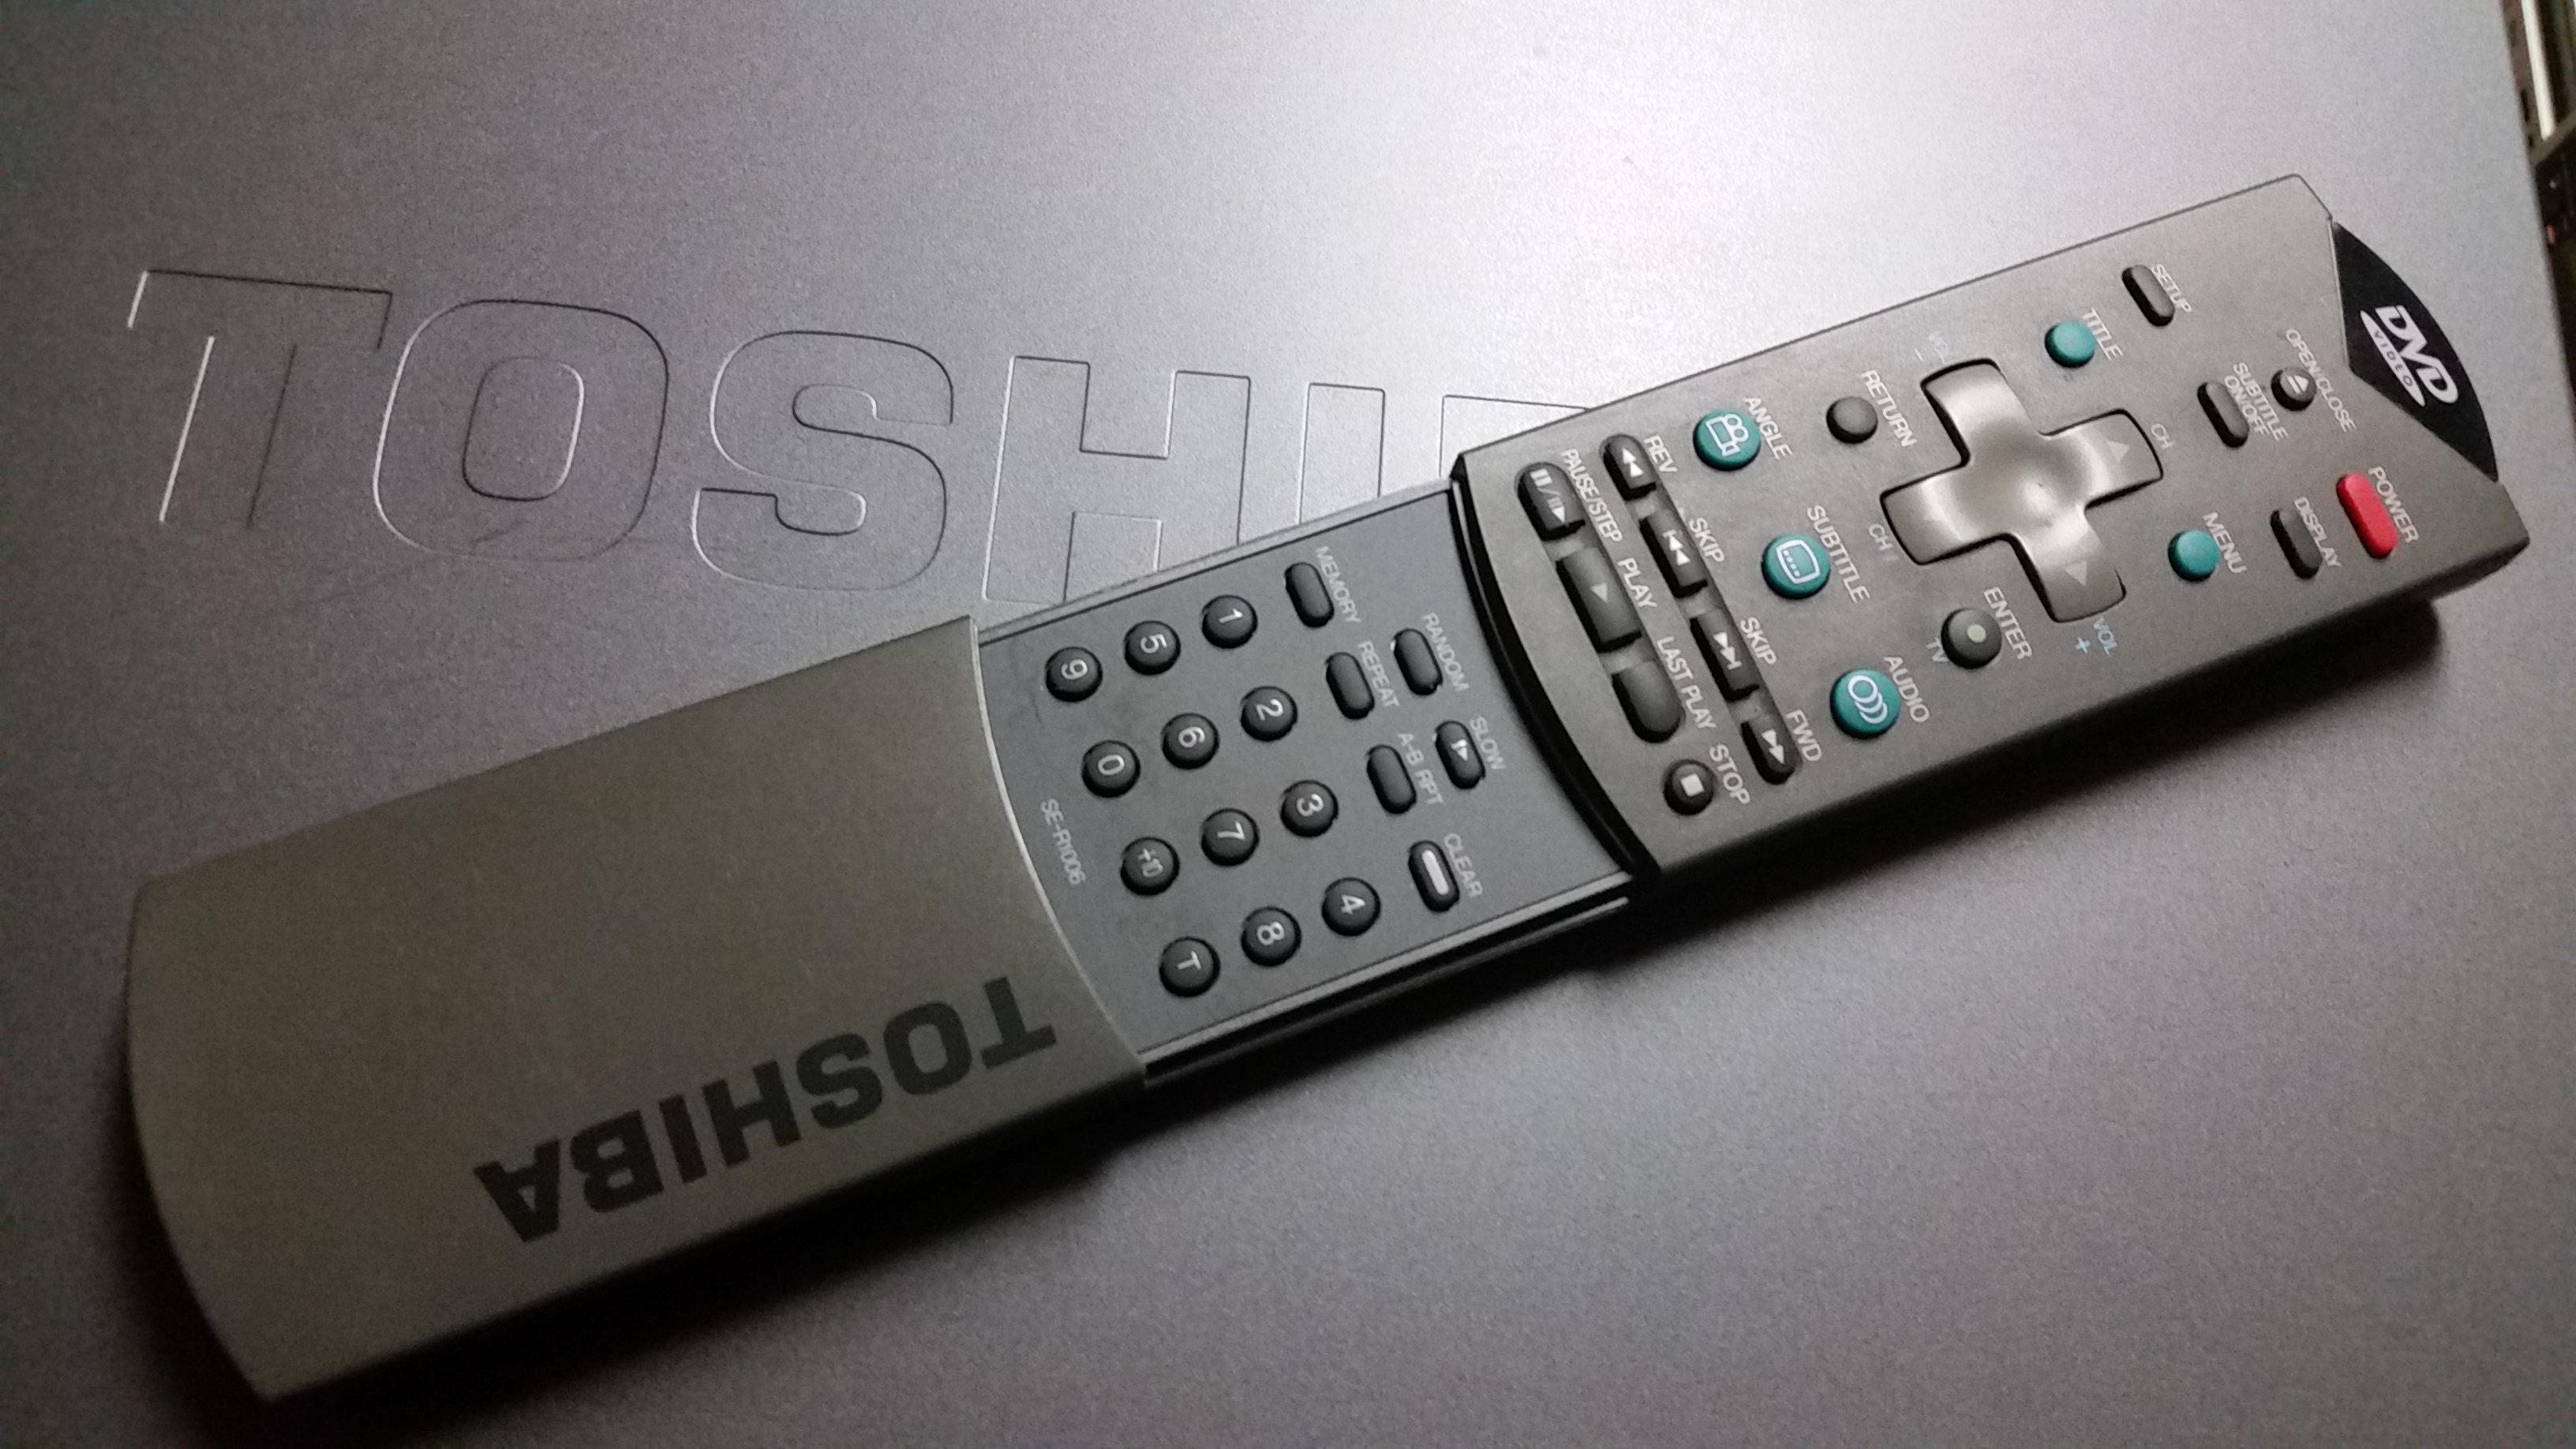 технологии второй половины 20 века: Toshiba SD-2006 DVD Player